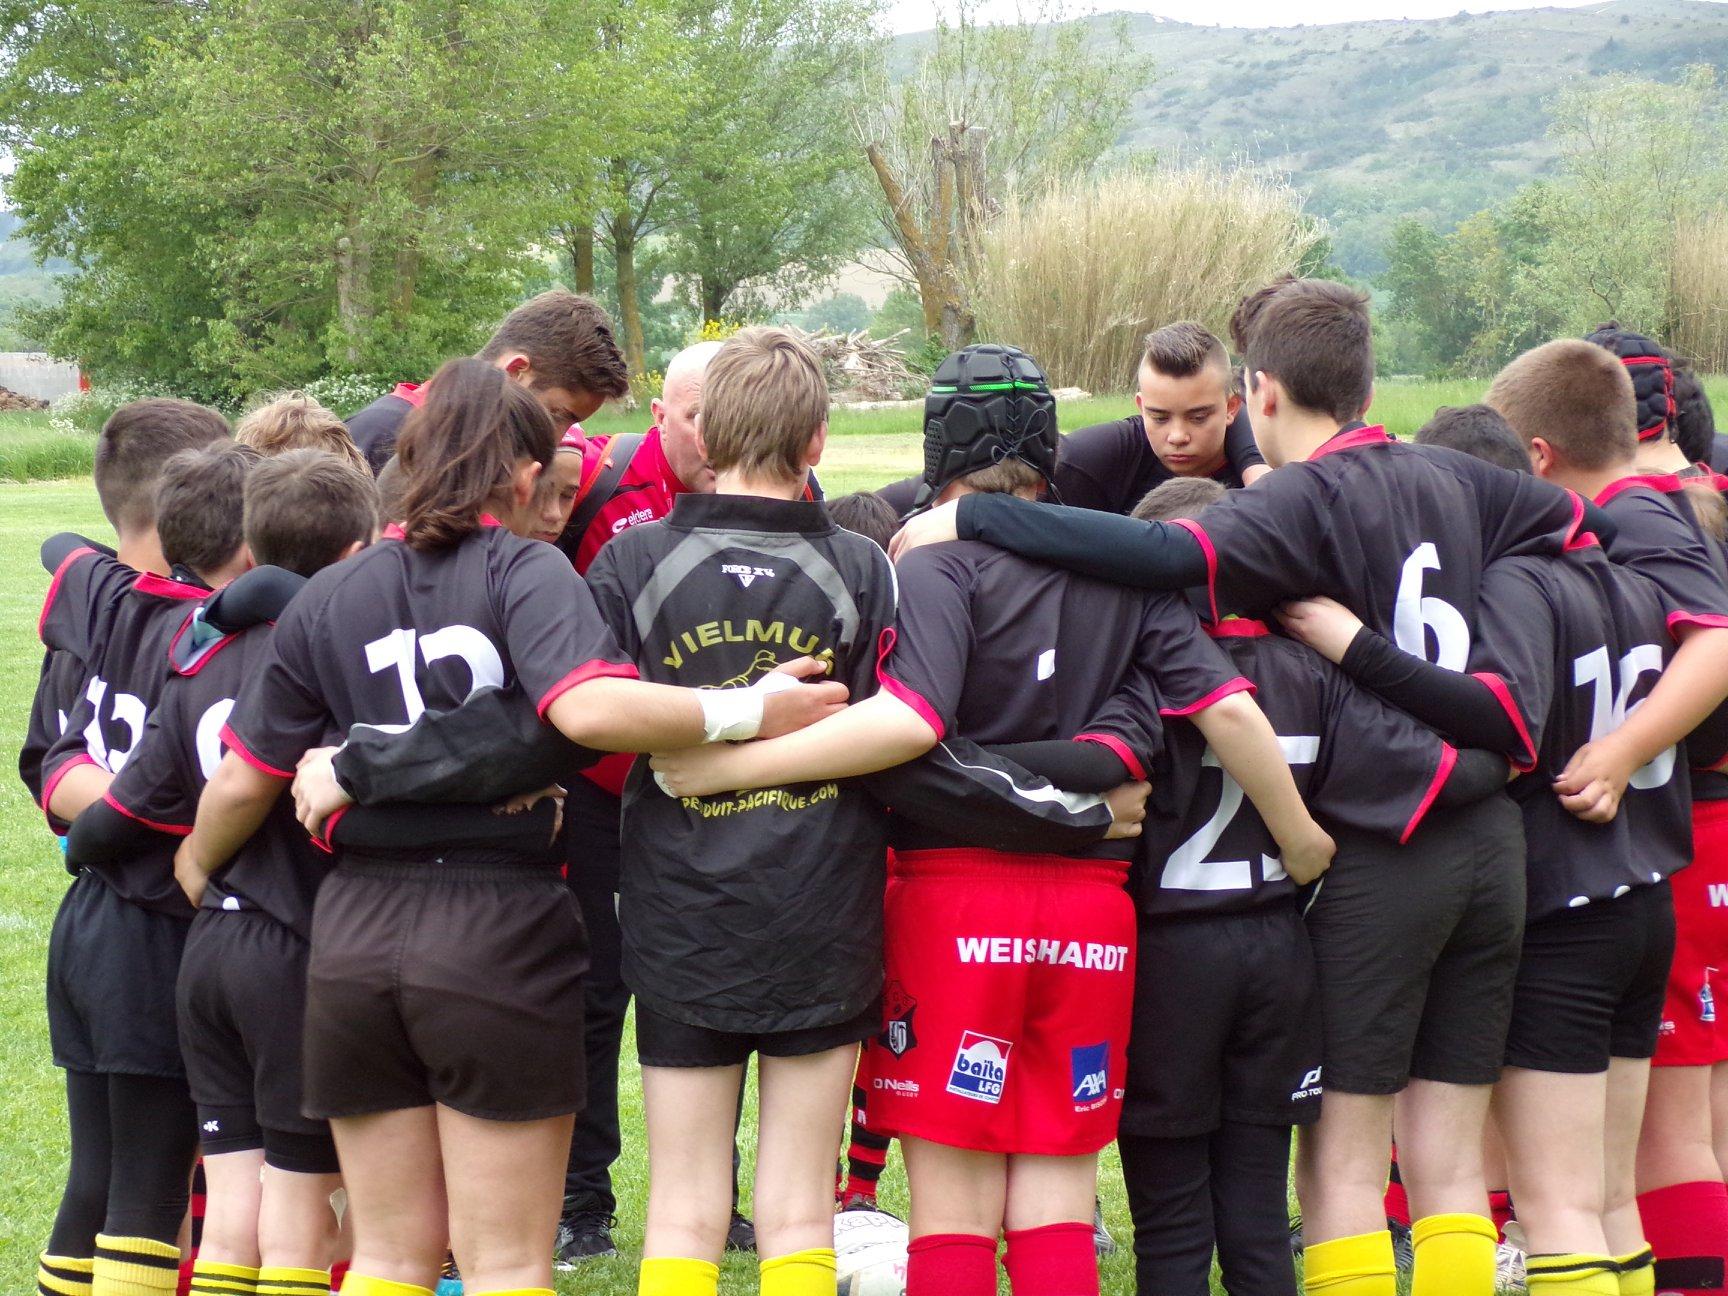 https://scg-rugby.com/wp-content/uploads/2018/05/32072964_10215642074023465_3884281900386222080_o.jpg